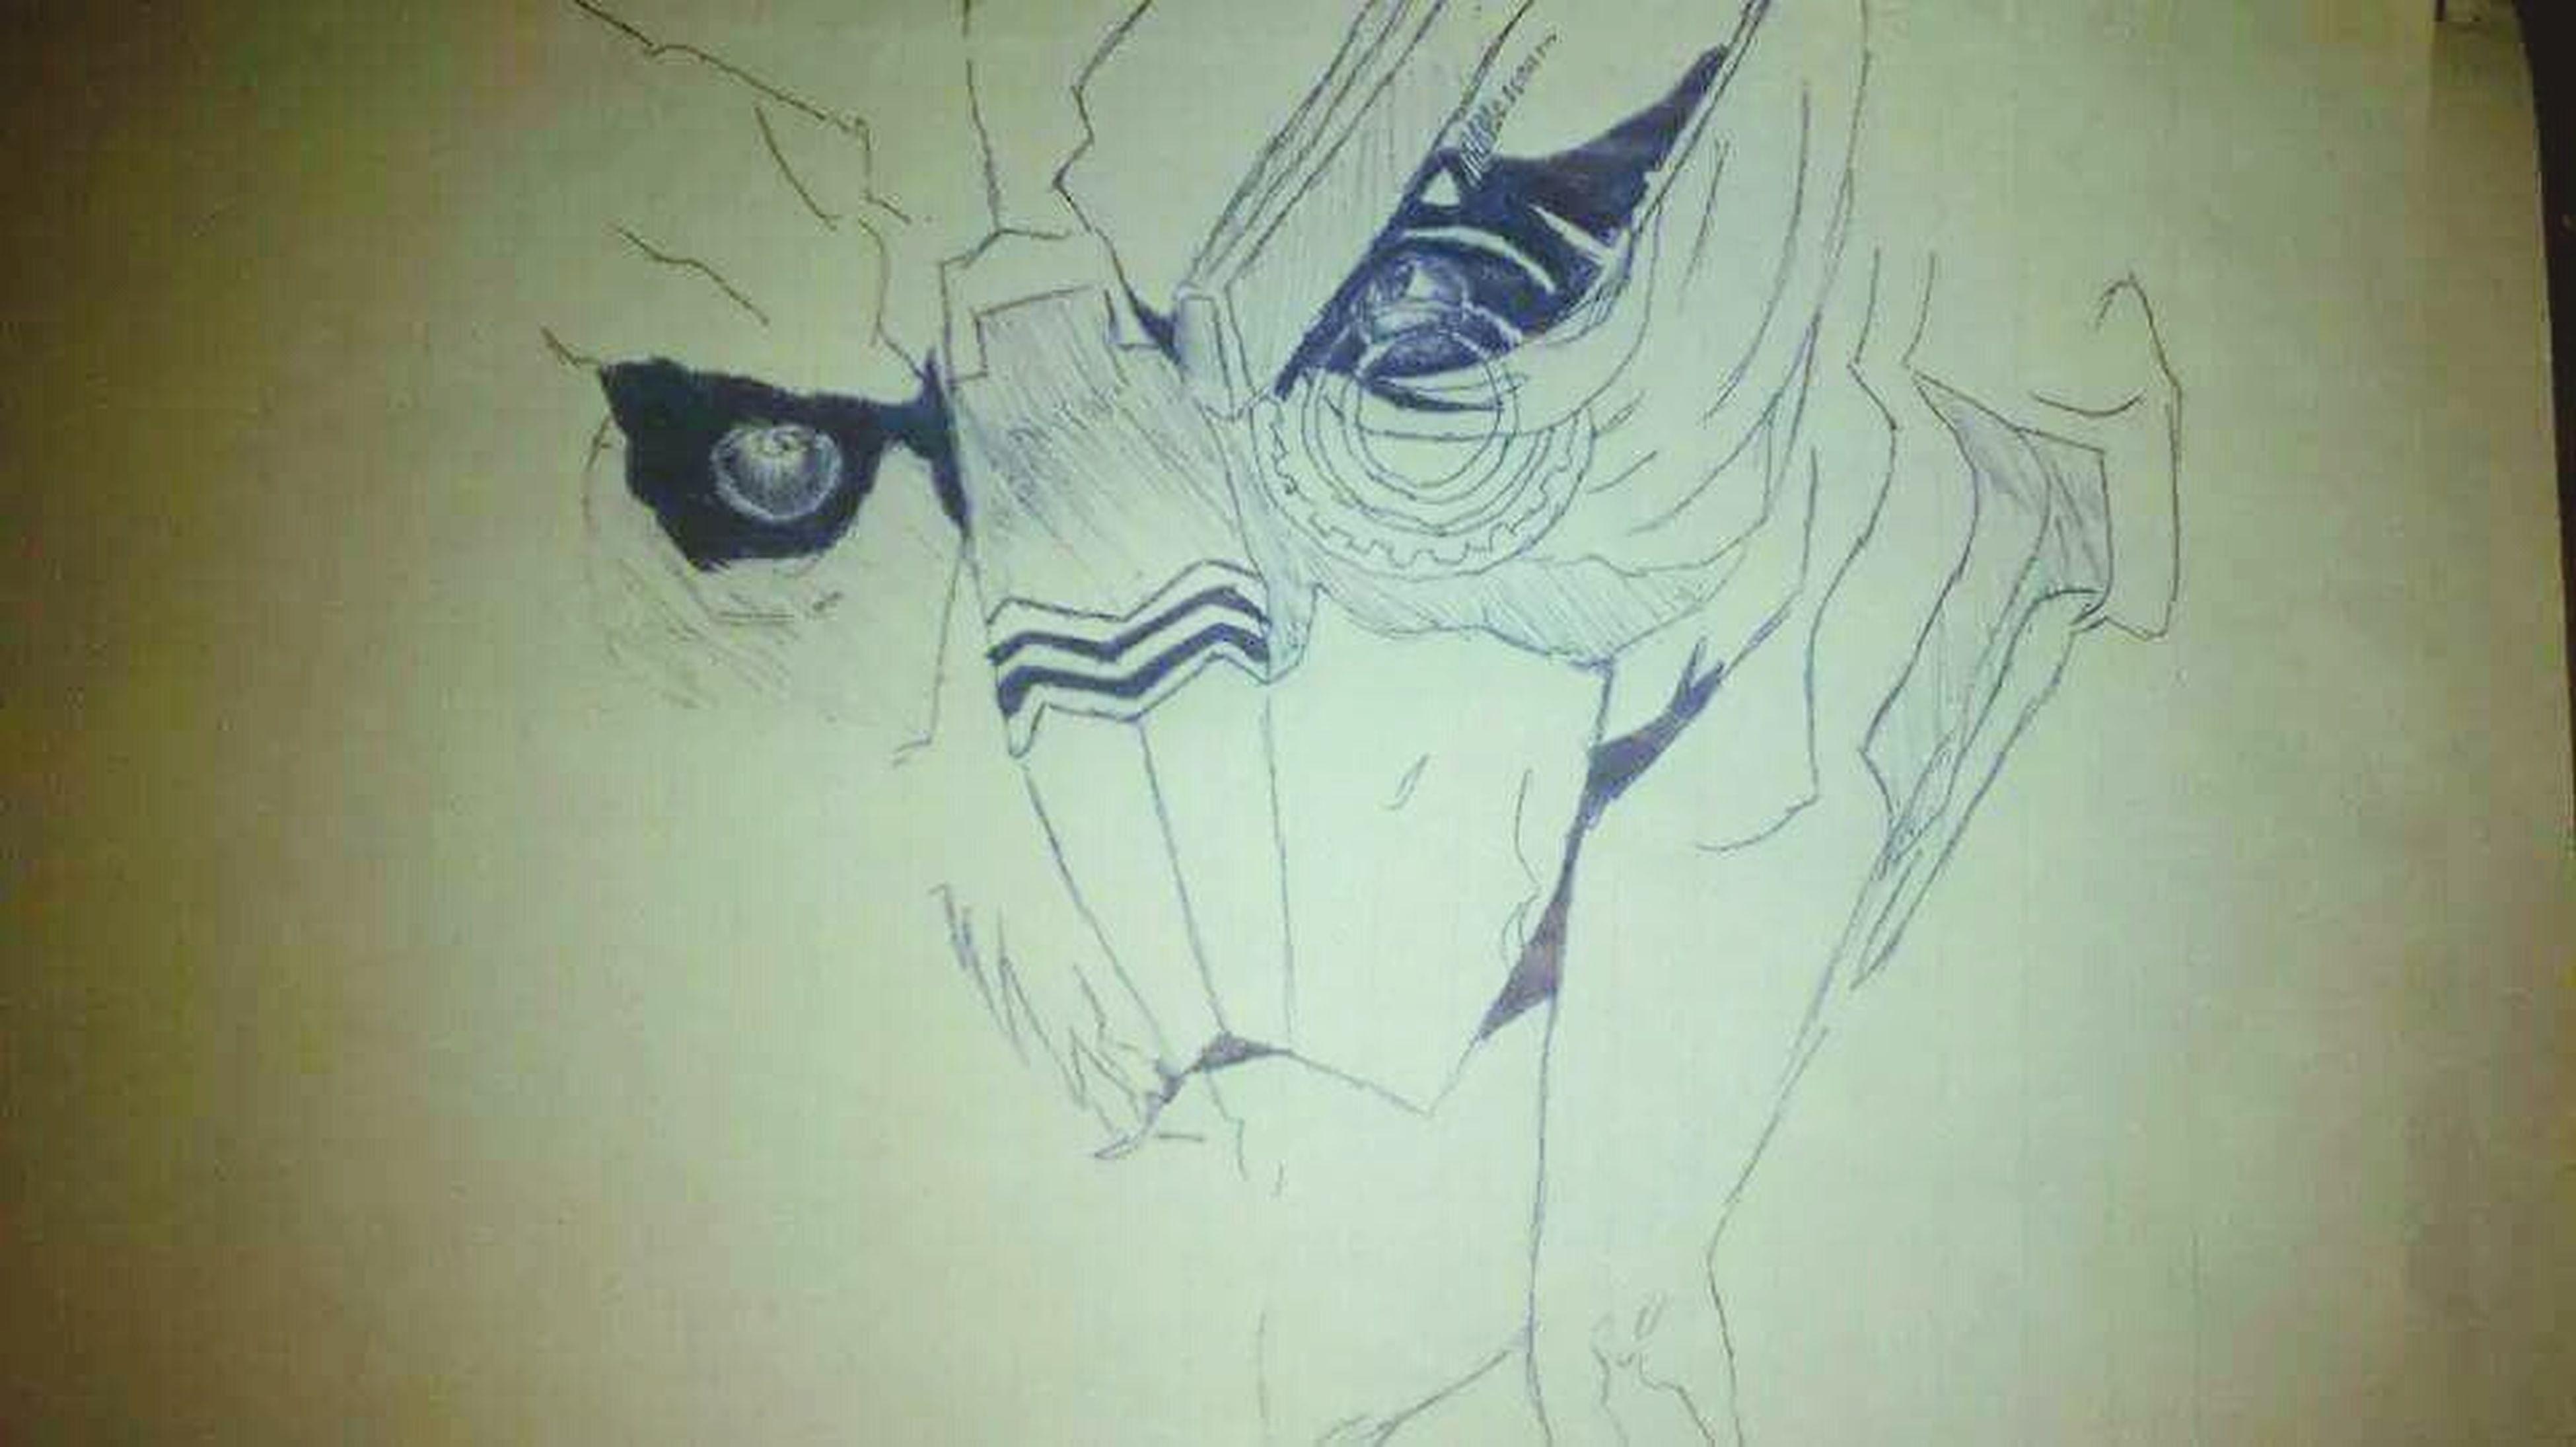 Drawing❤ Drawing Art ArtWork Art, Drawing, Creativity Masseffect Garrusvakarian Sketch Sketchbook Doodle Artsy First Eyeem Photo Love ♥